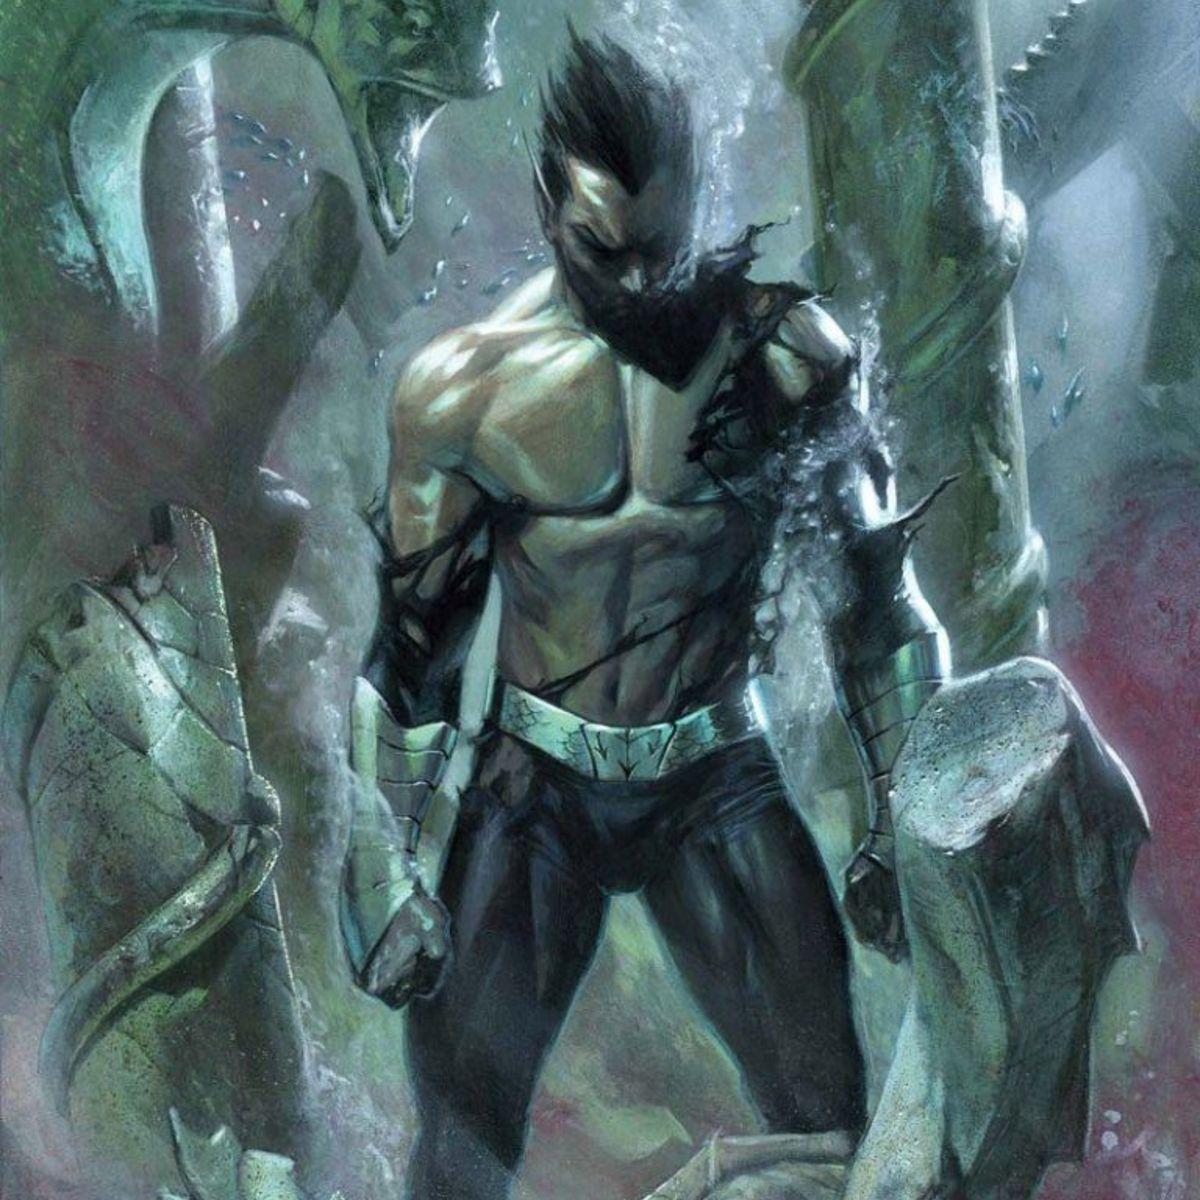 Namor-The-Sub-Mariner.jpg